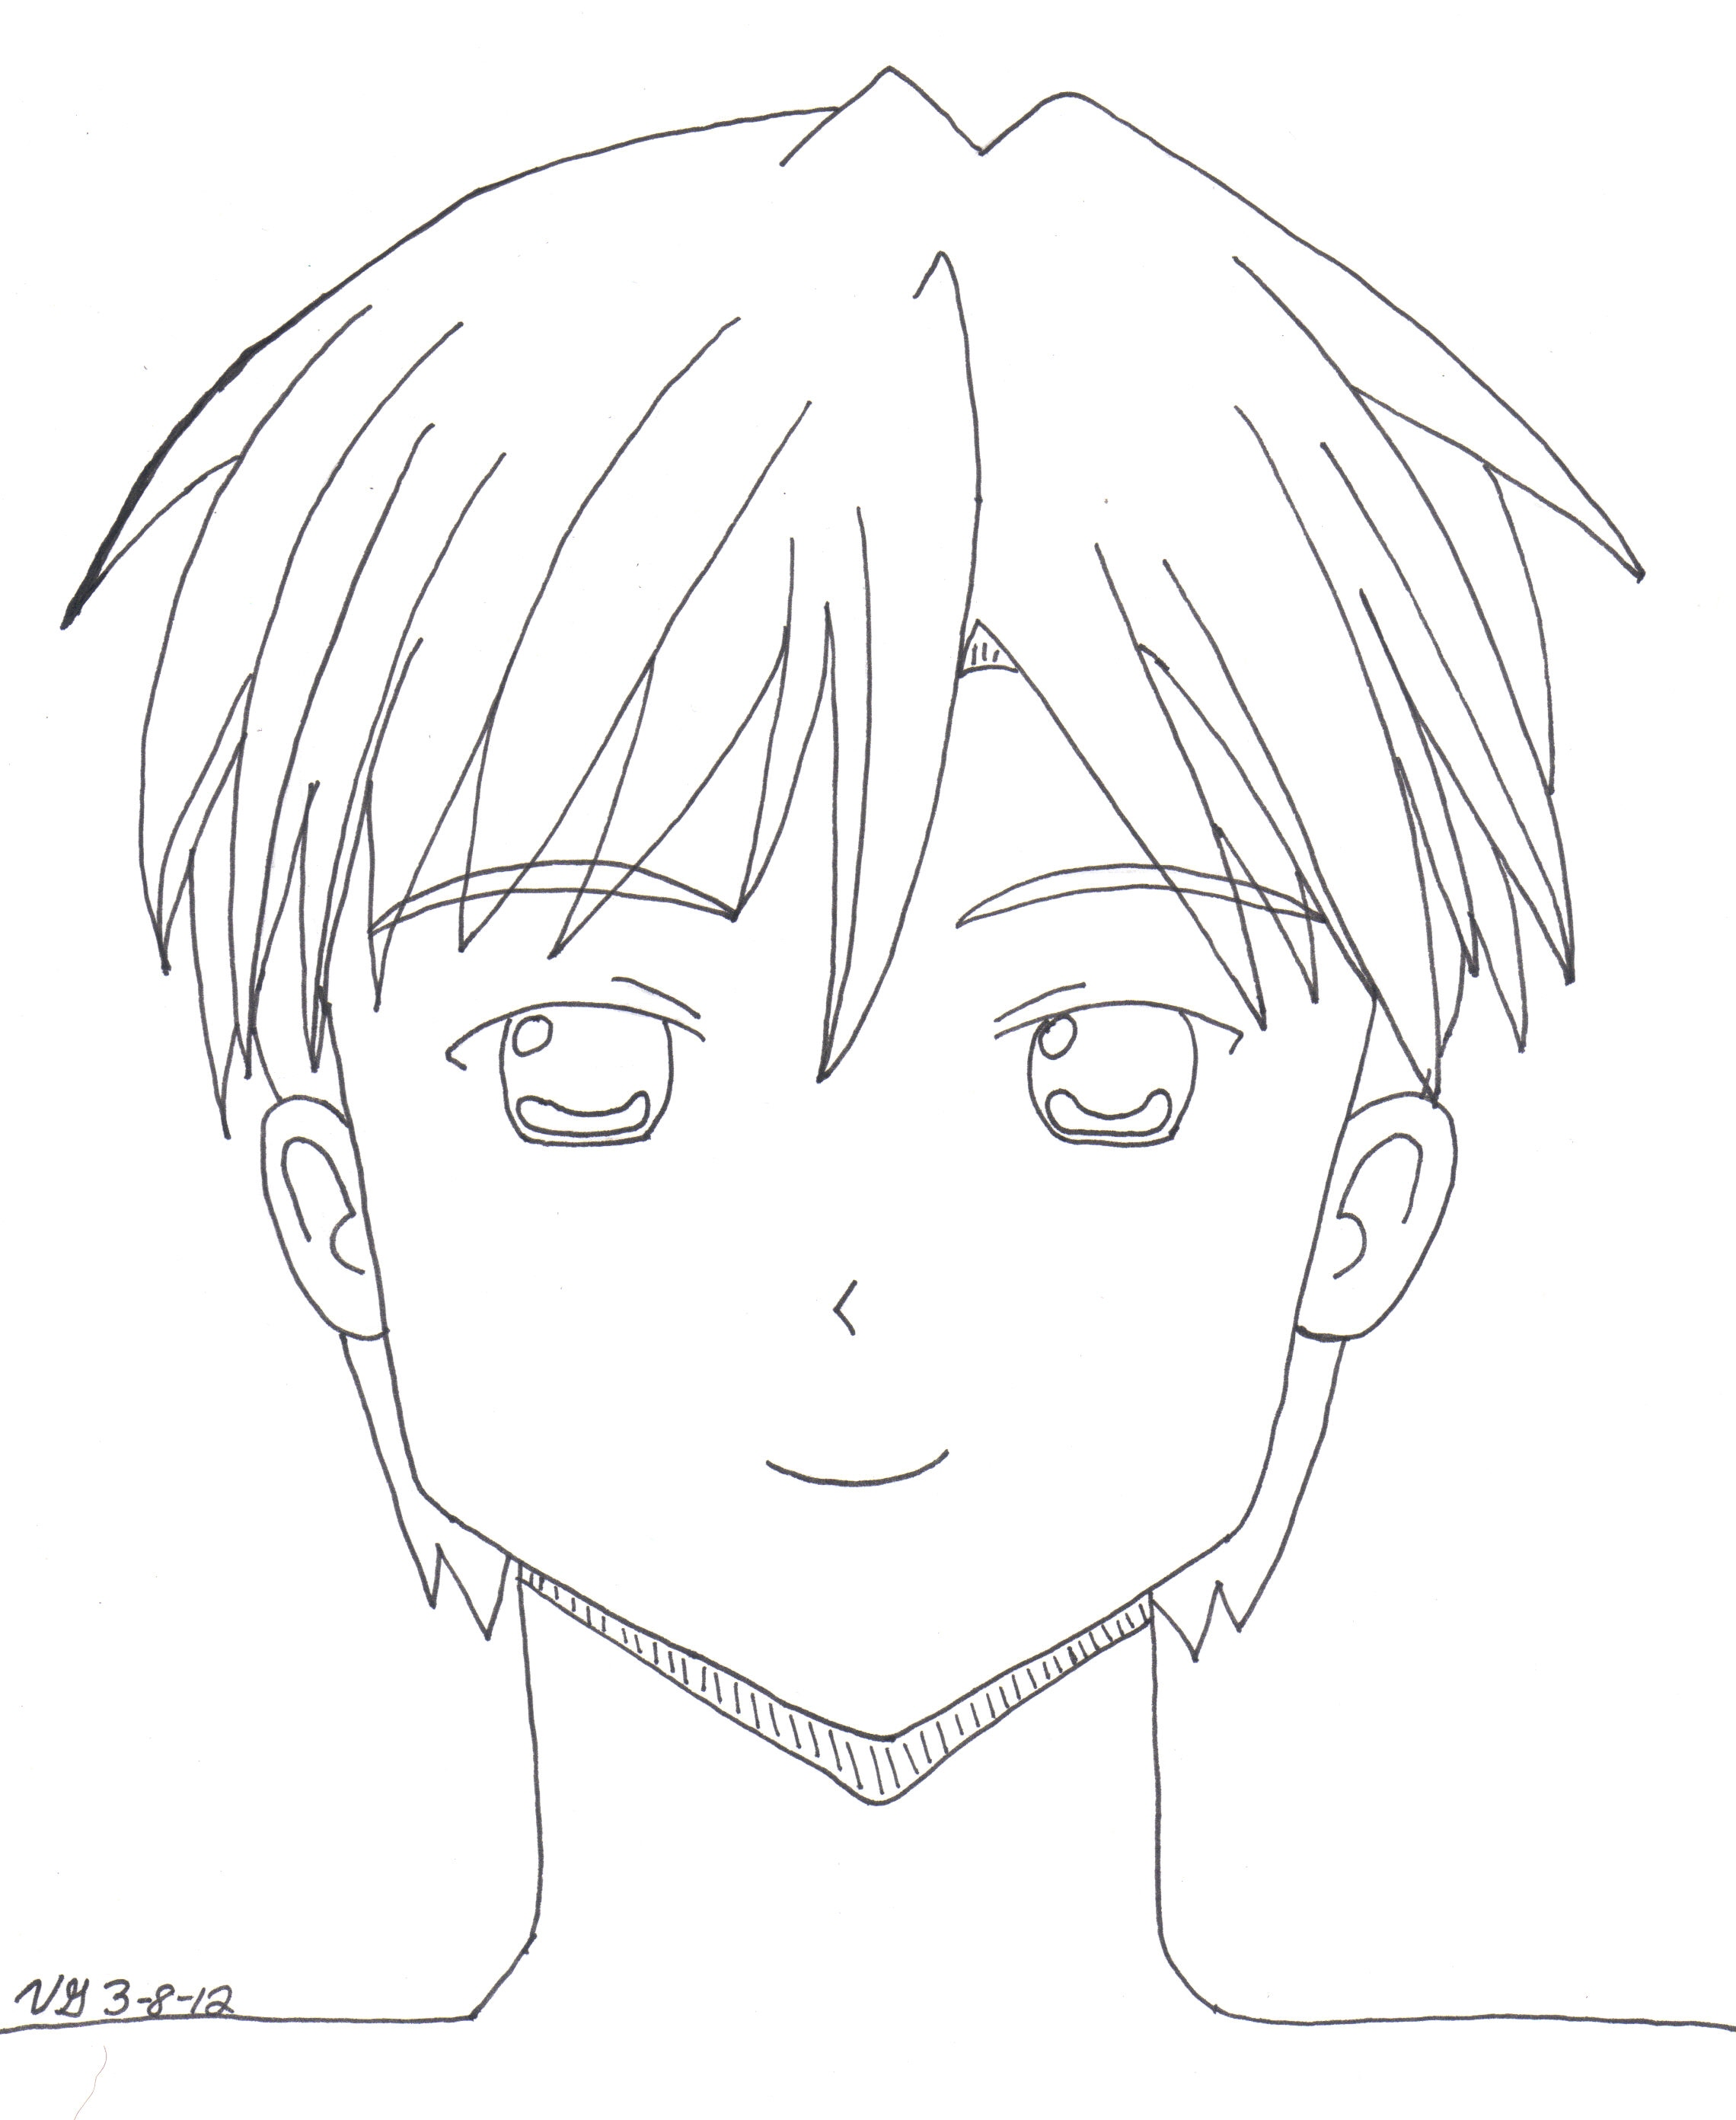 2280x2784 drawings manga boy woman anime line art Nittoai